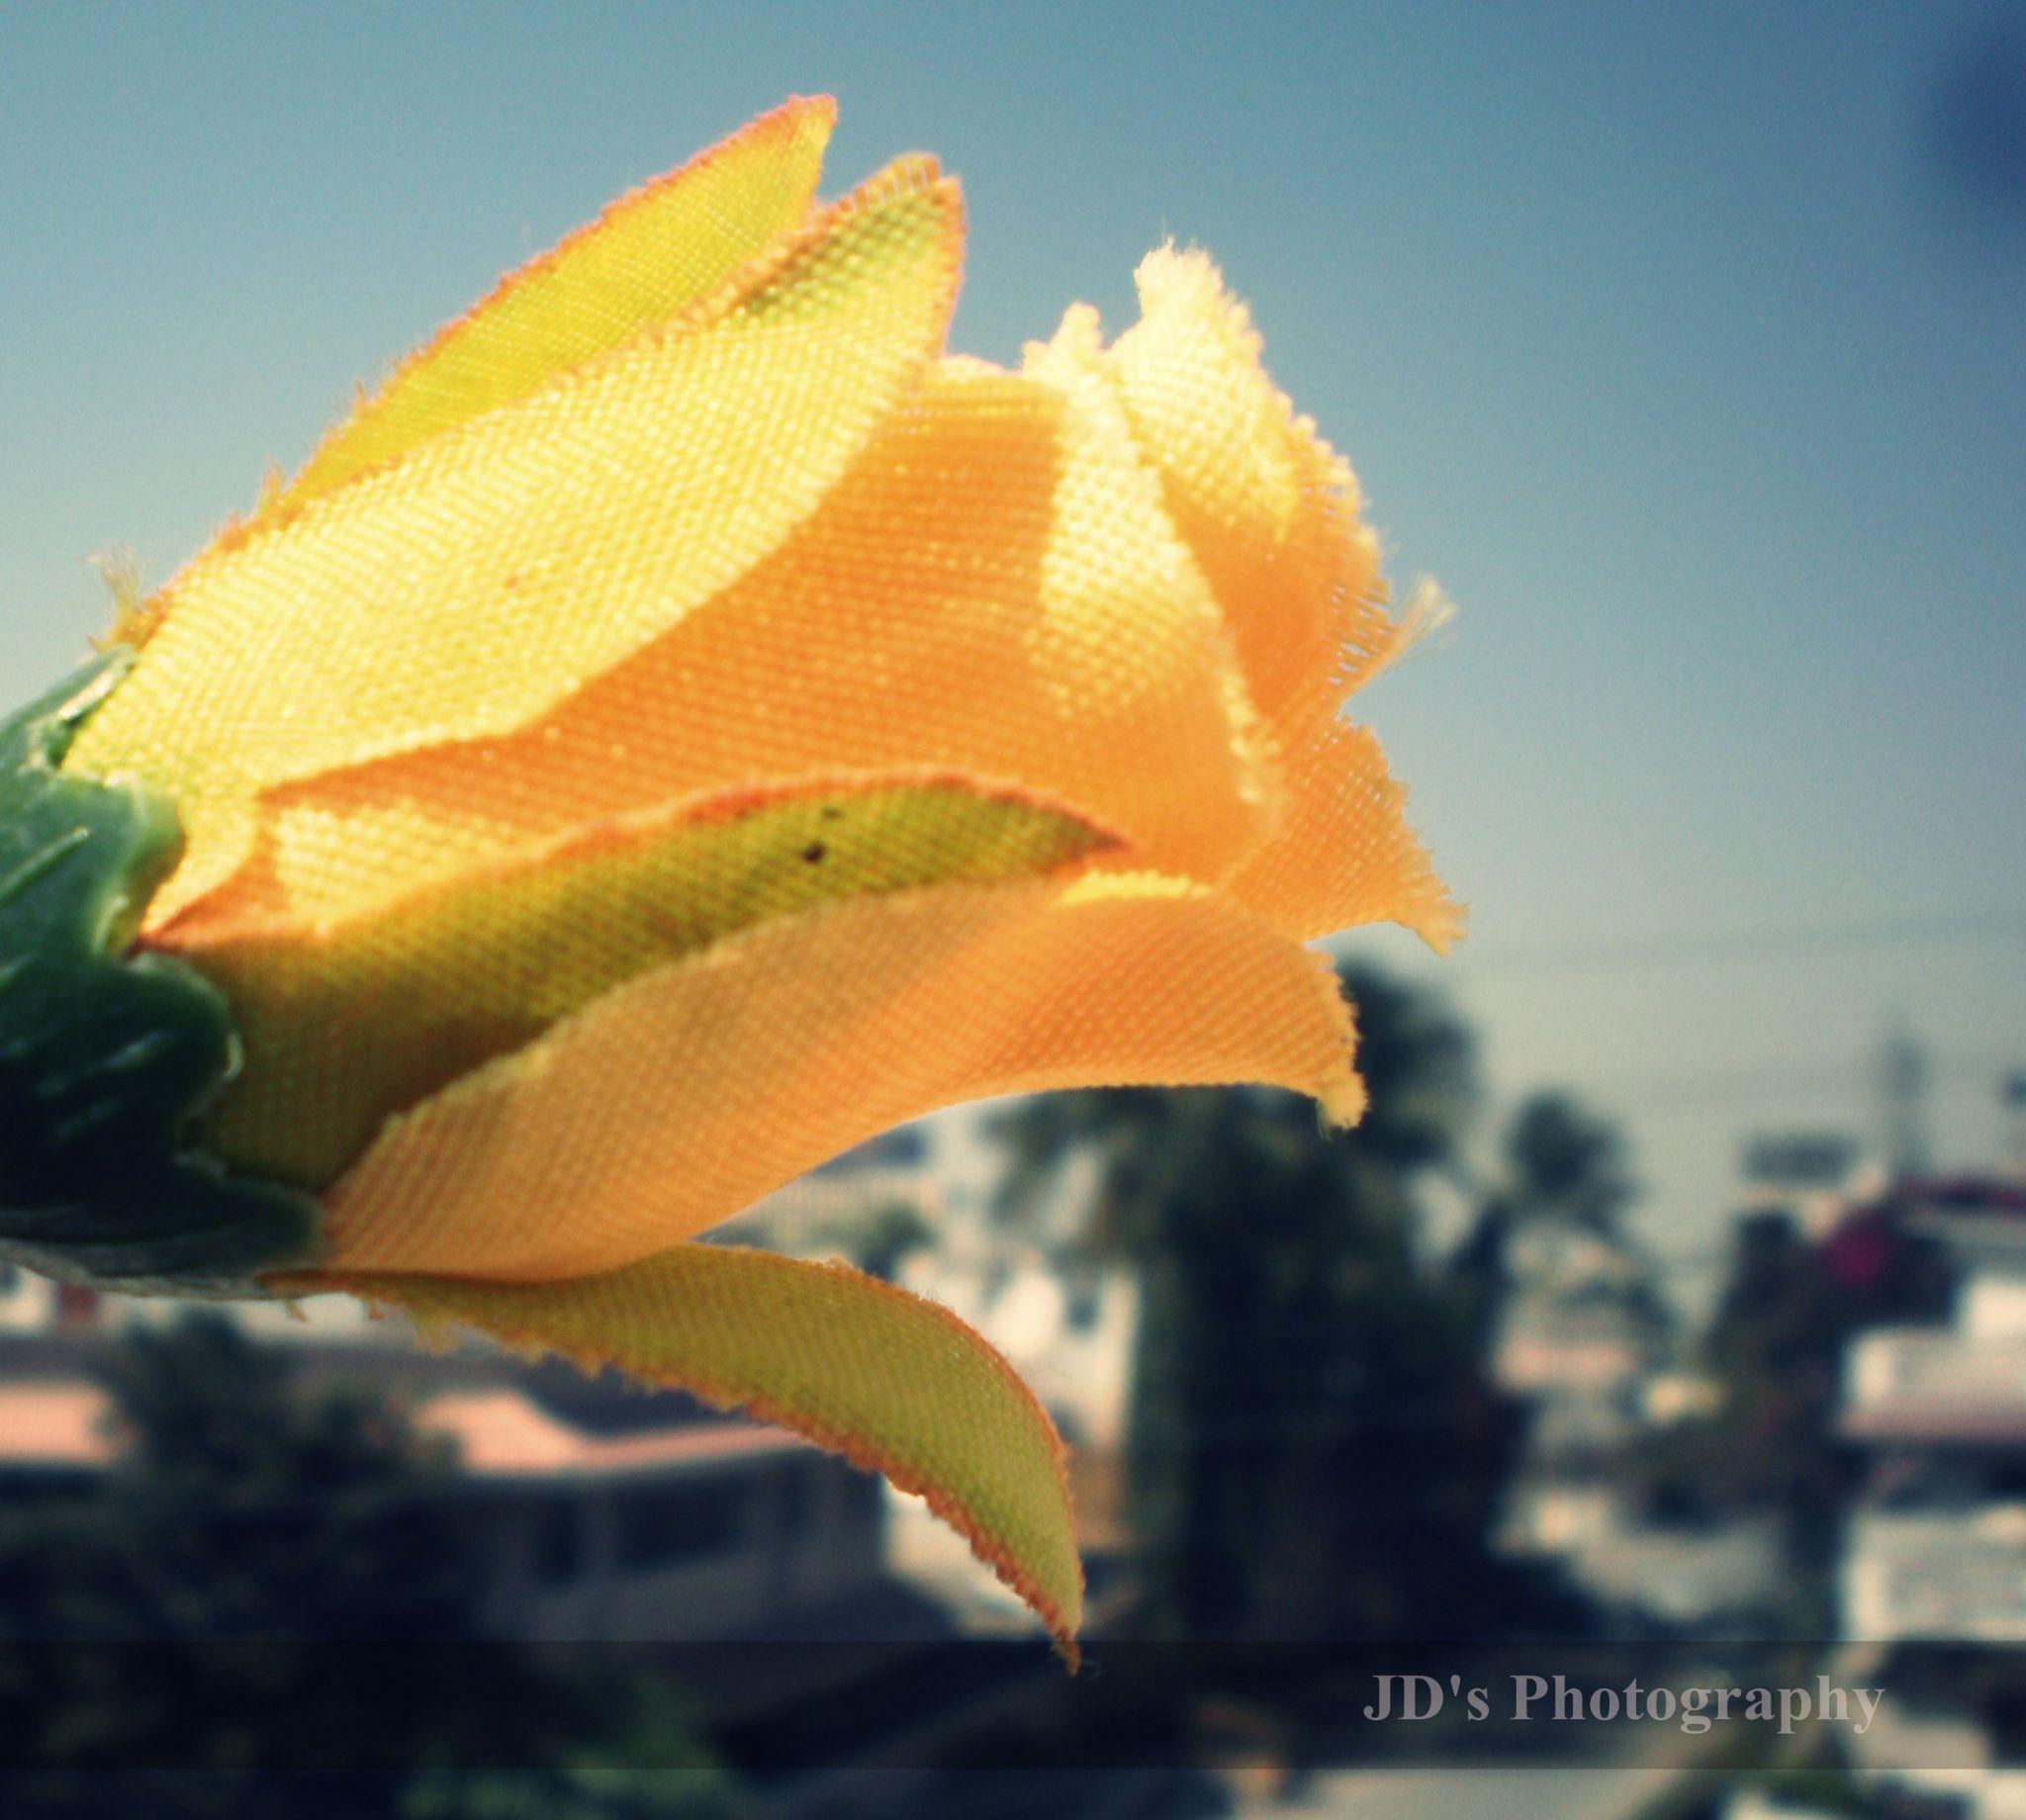 Yellow (JD's Photography) by jawwad.khalil.16